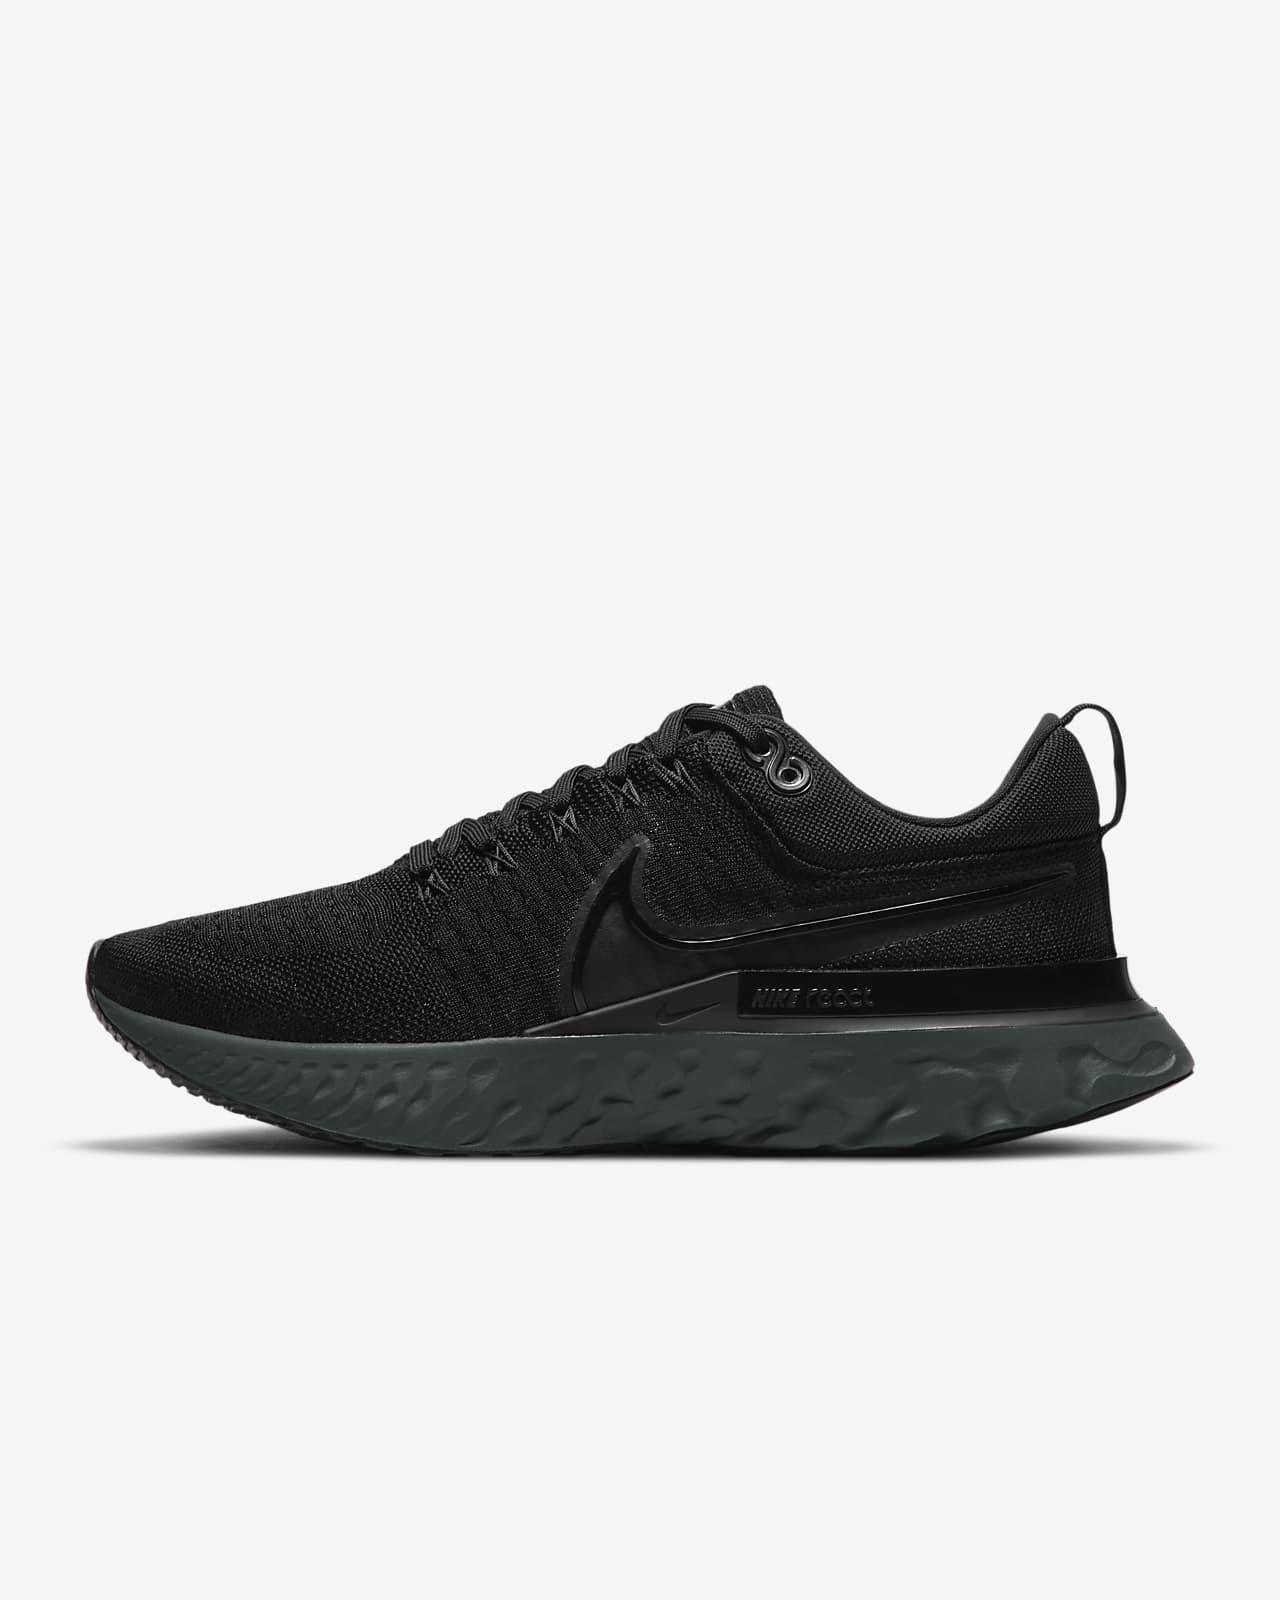 Chaussure de running Nike React Infinity Run Flyknit 2 pour Homme